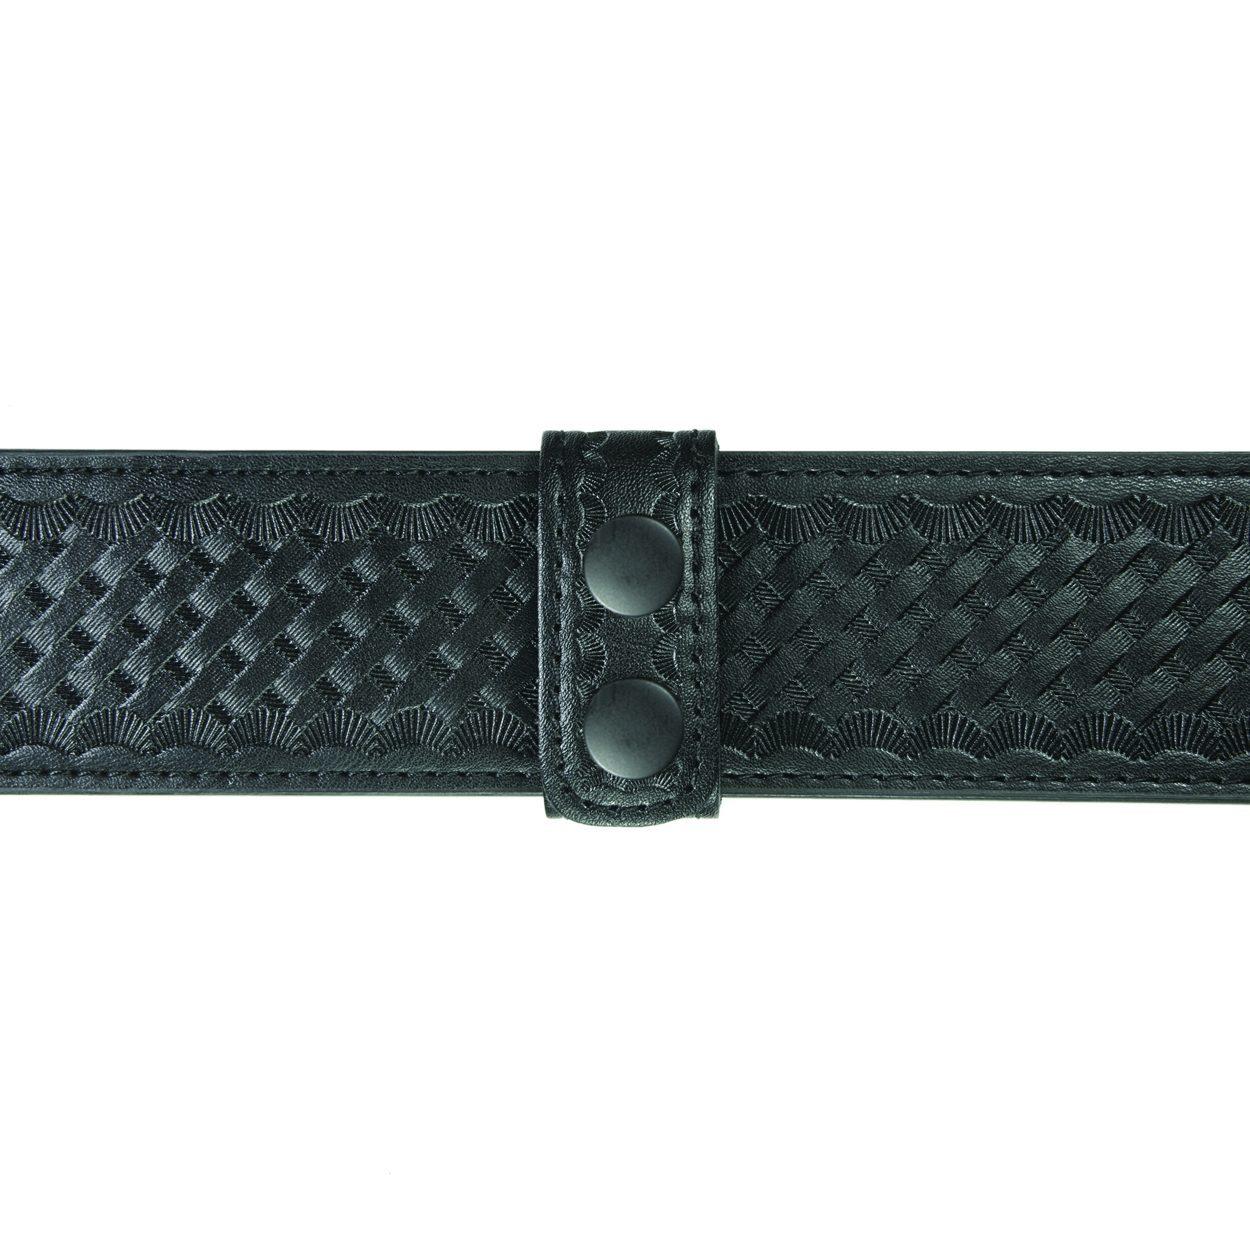 "Belt Keepers, 2 1/4"" Belt, 2 Pack, Deluxe, AirTek, BW, Black Snaps-"